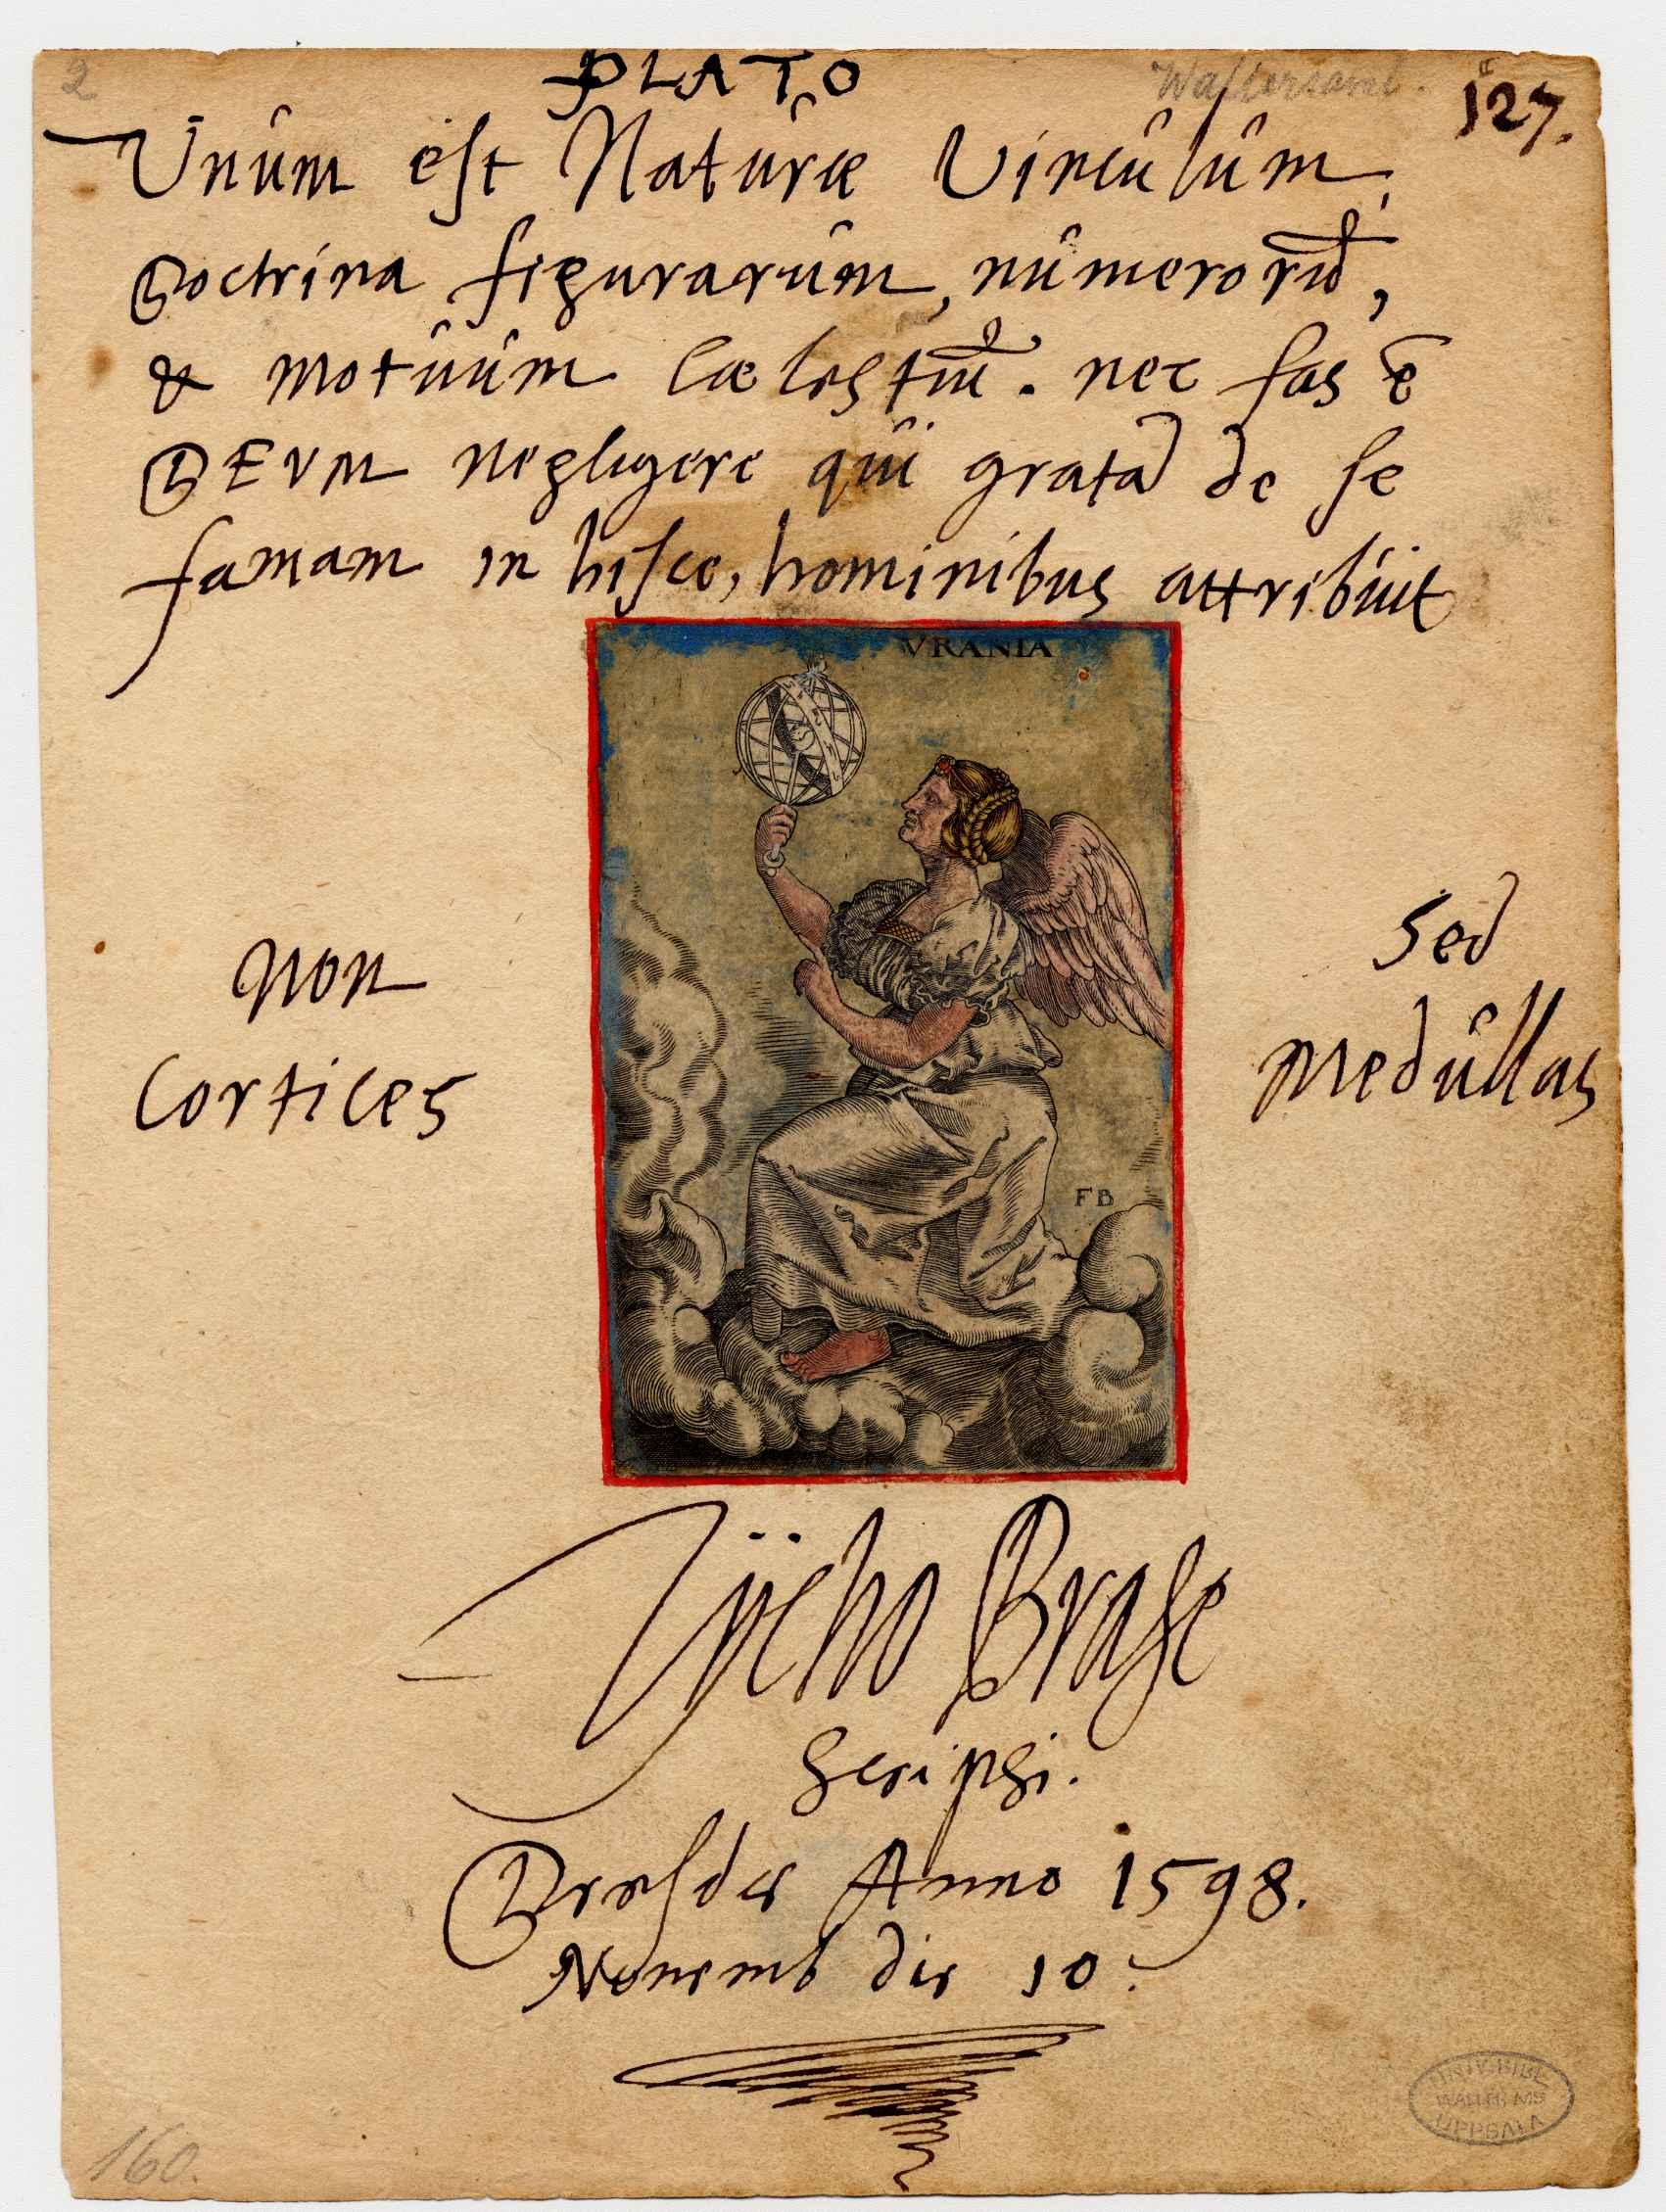 File:Tycho Brahe signature 1598.jpg